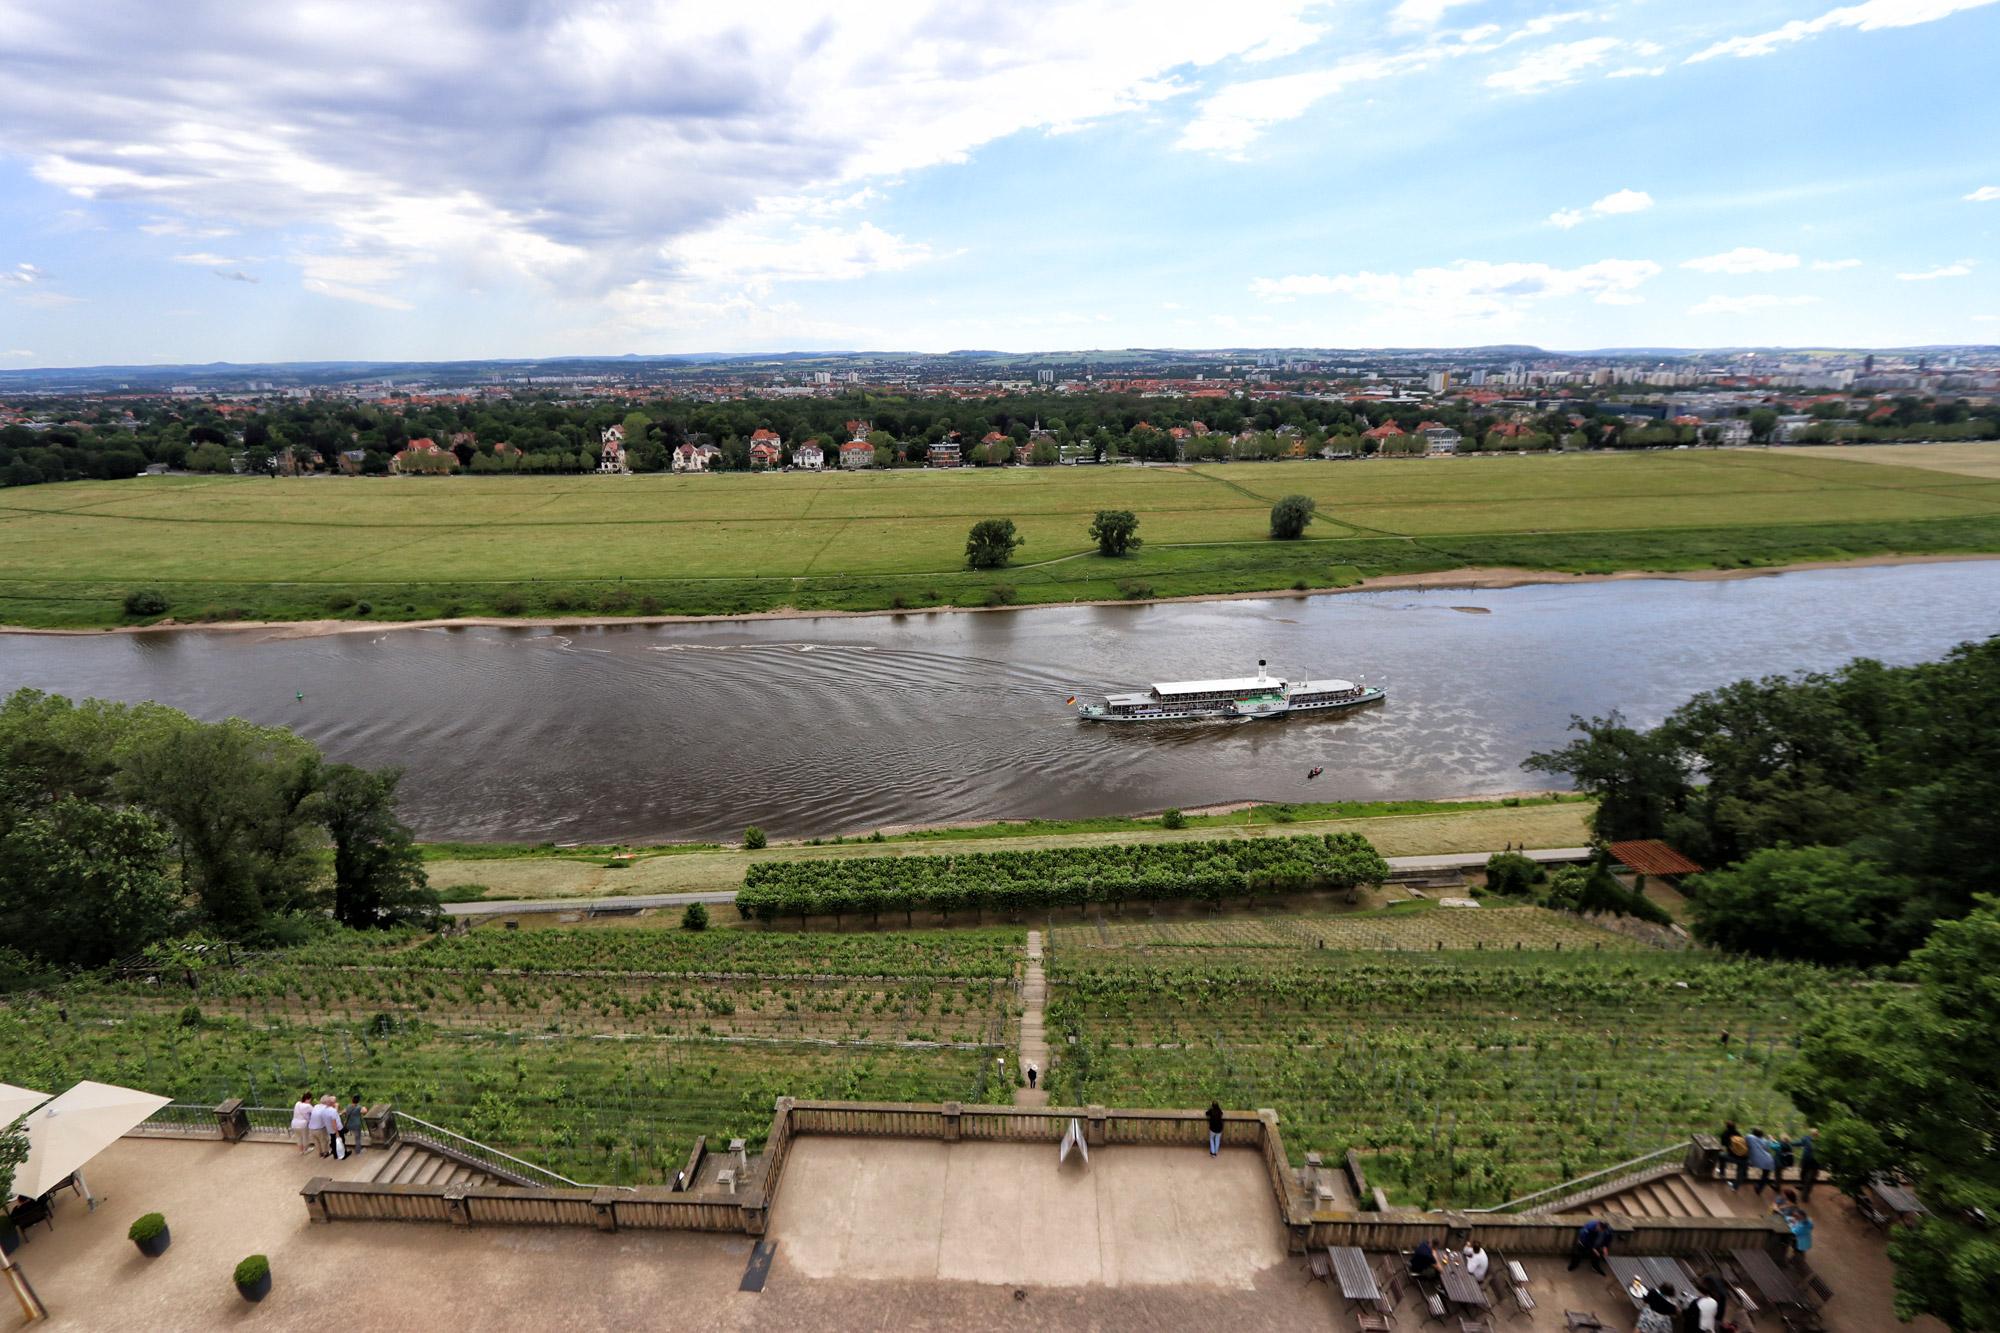 Dresden tips - Sächsische Dampfschiffahrt